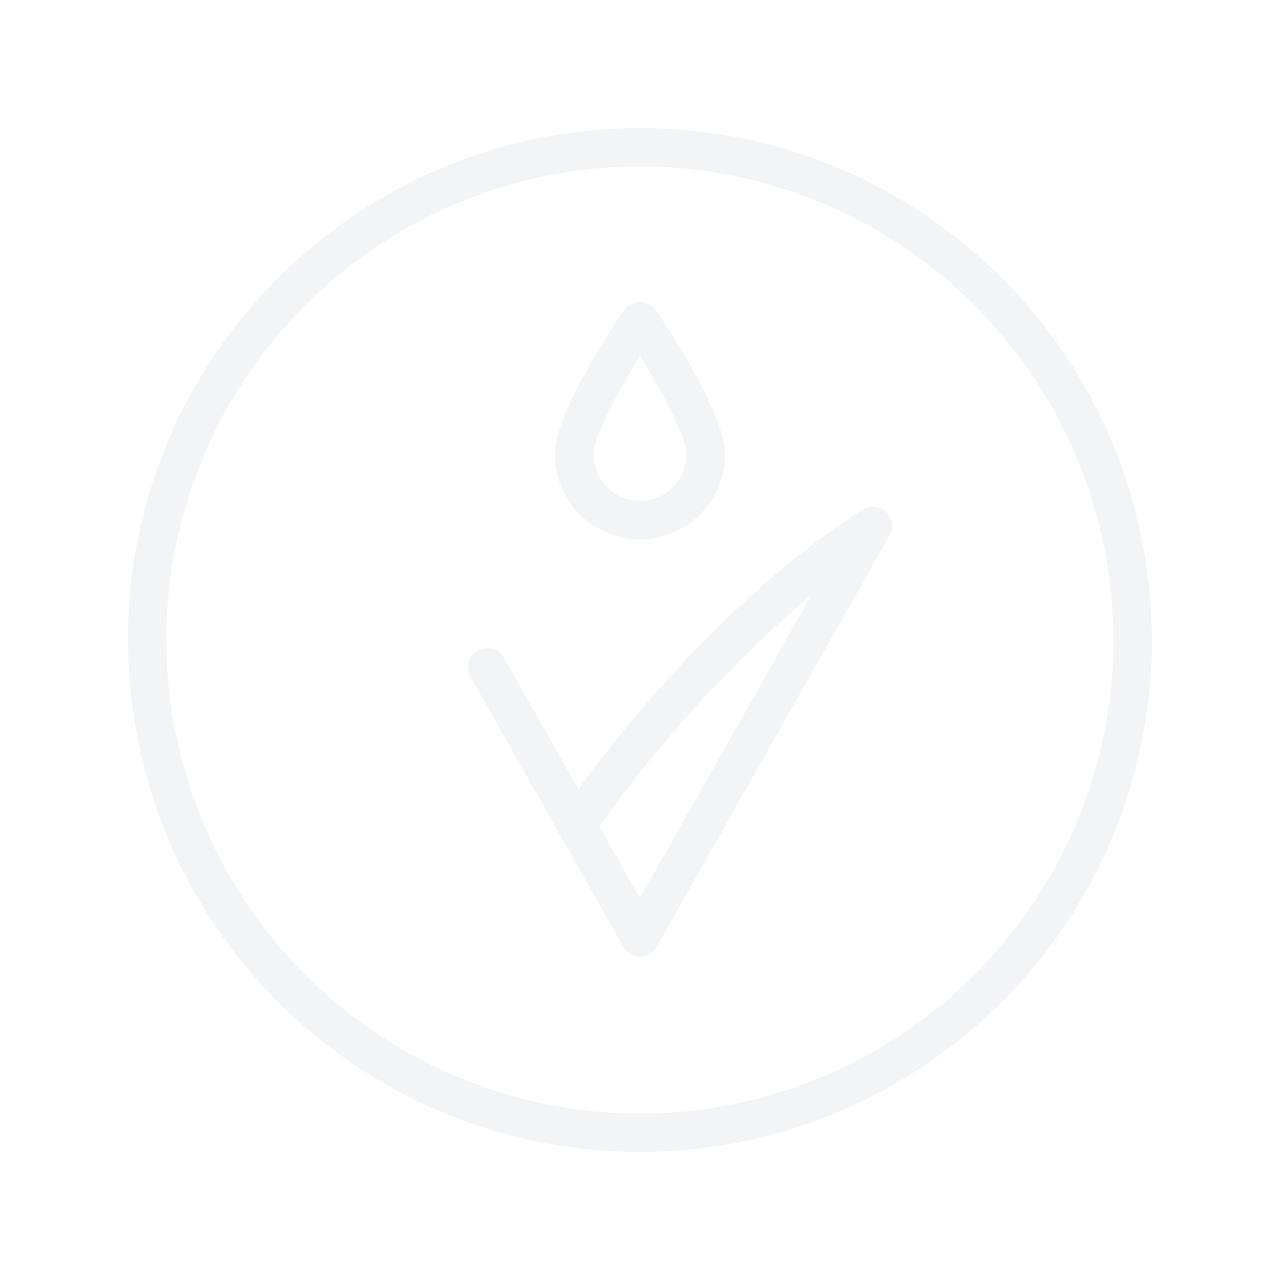 ALESSANDRO Nail Polish No.08 Nude Elegance 5ml